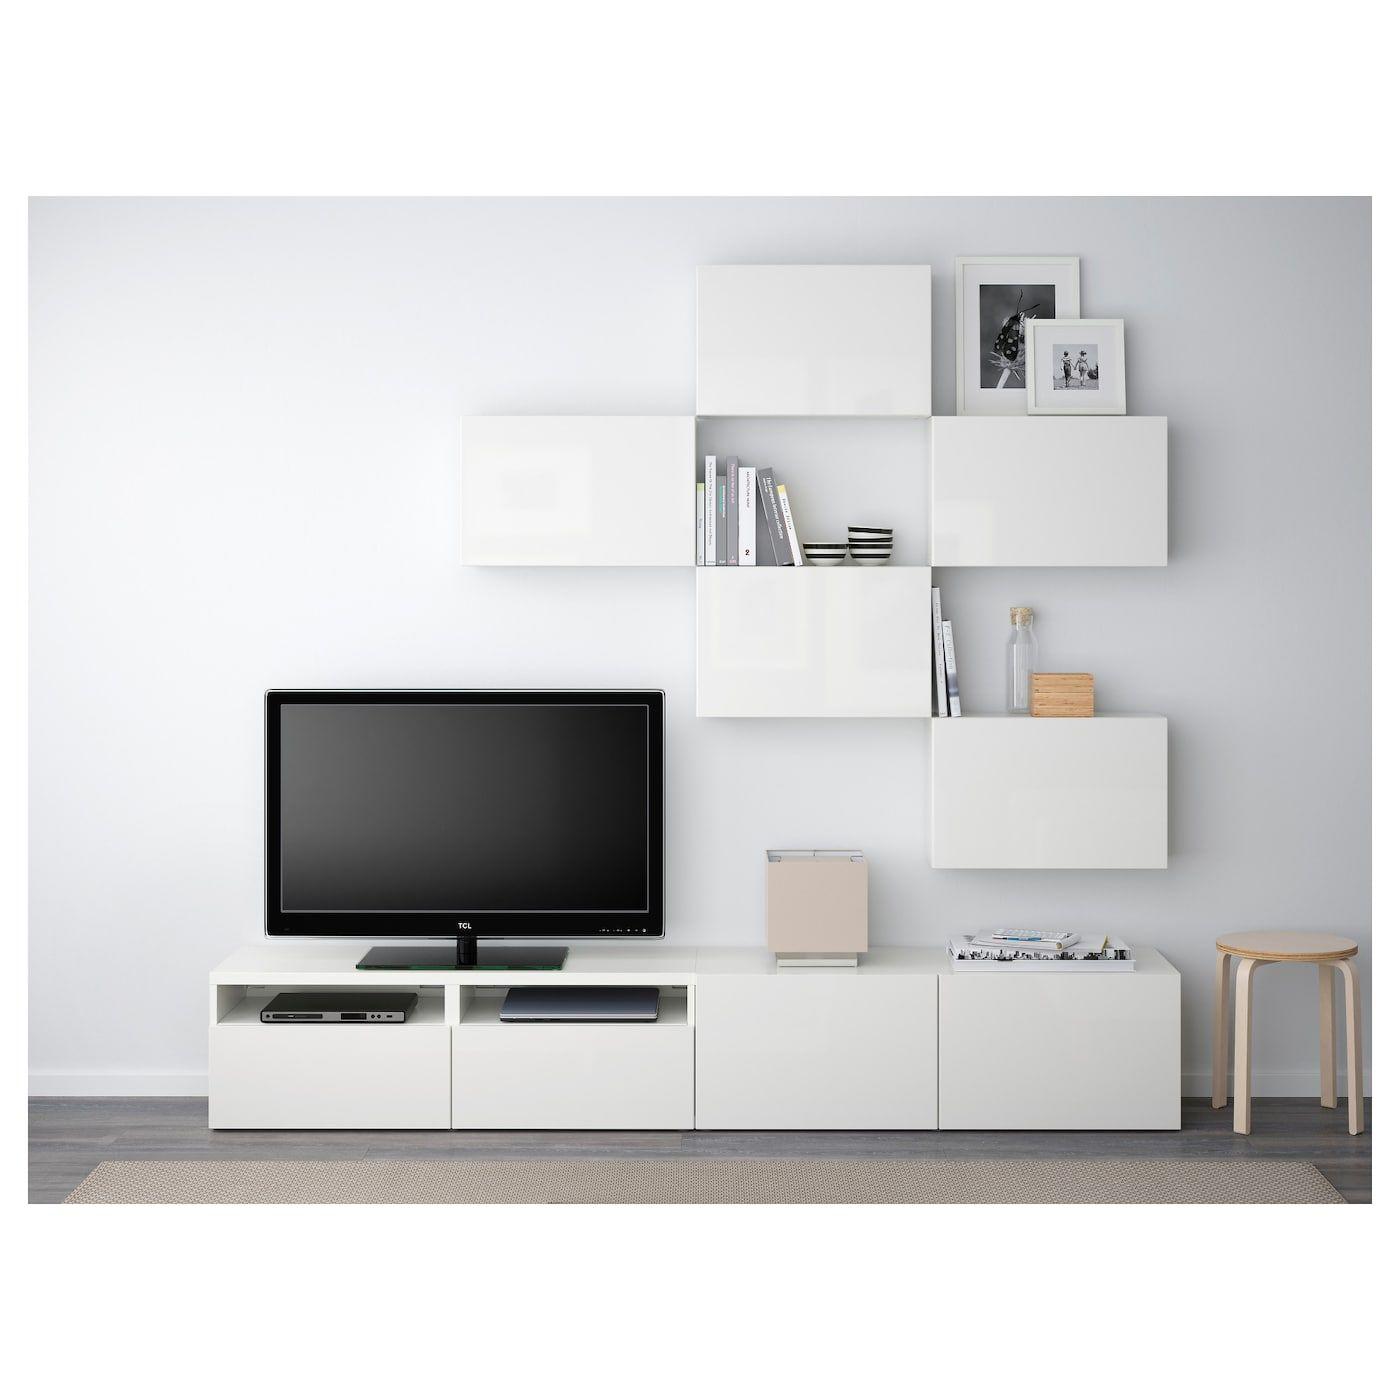 Ikea Us Furniture And Home Furnishings Tv Storage Living Room Tv Home